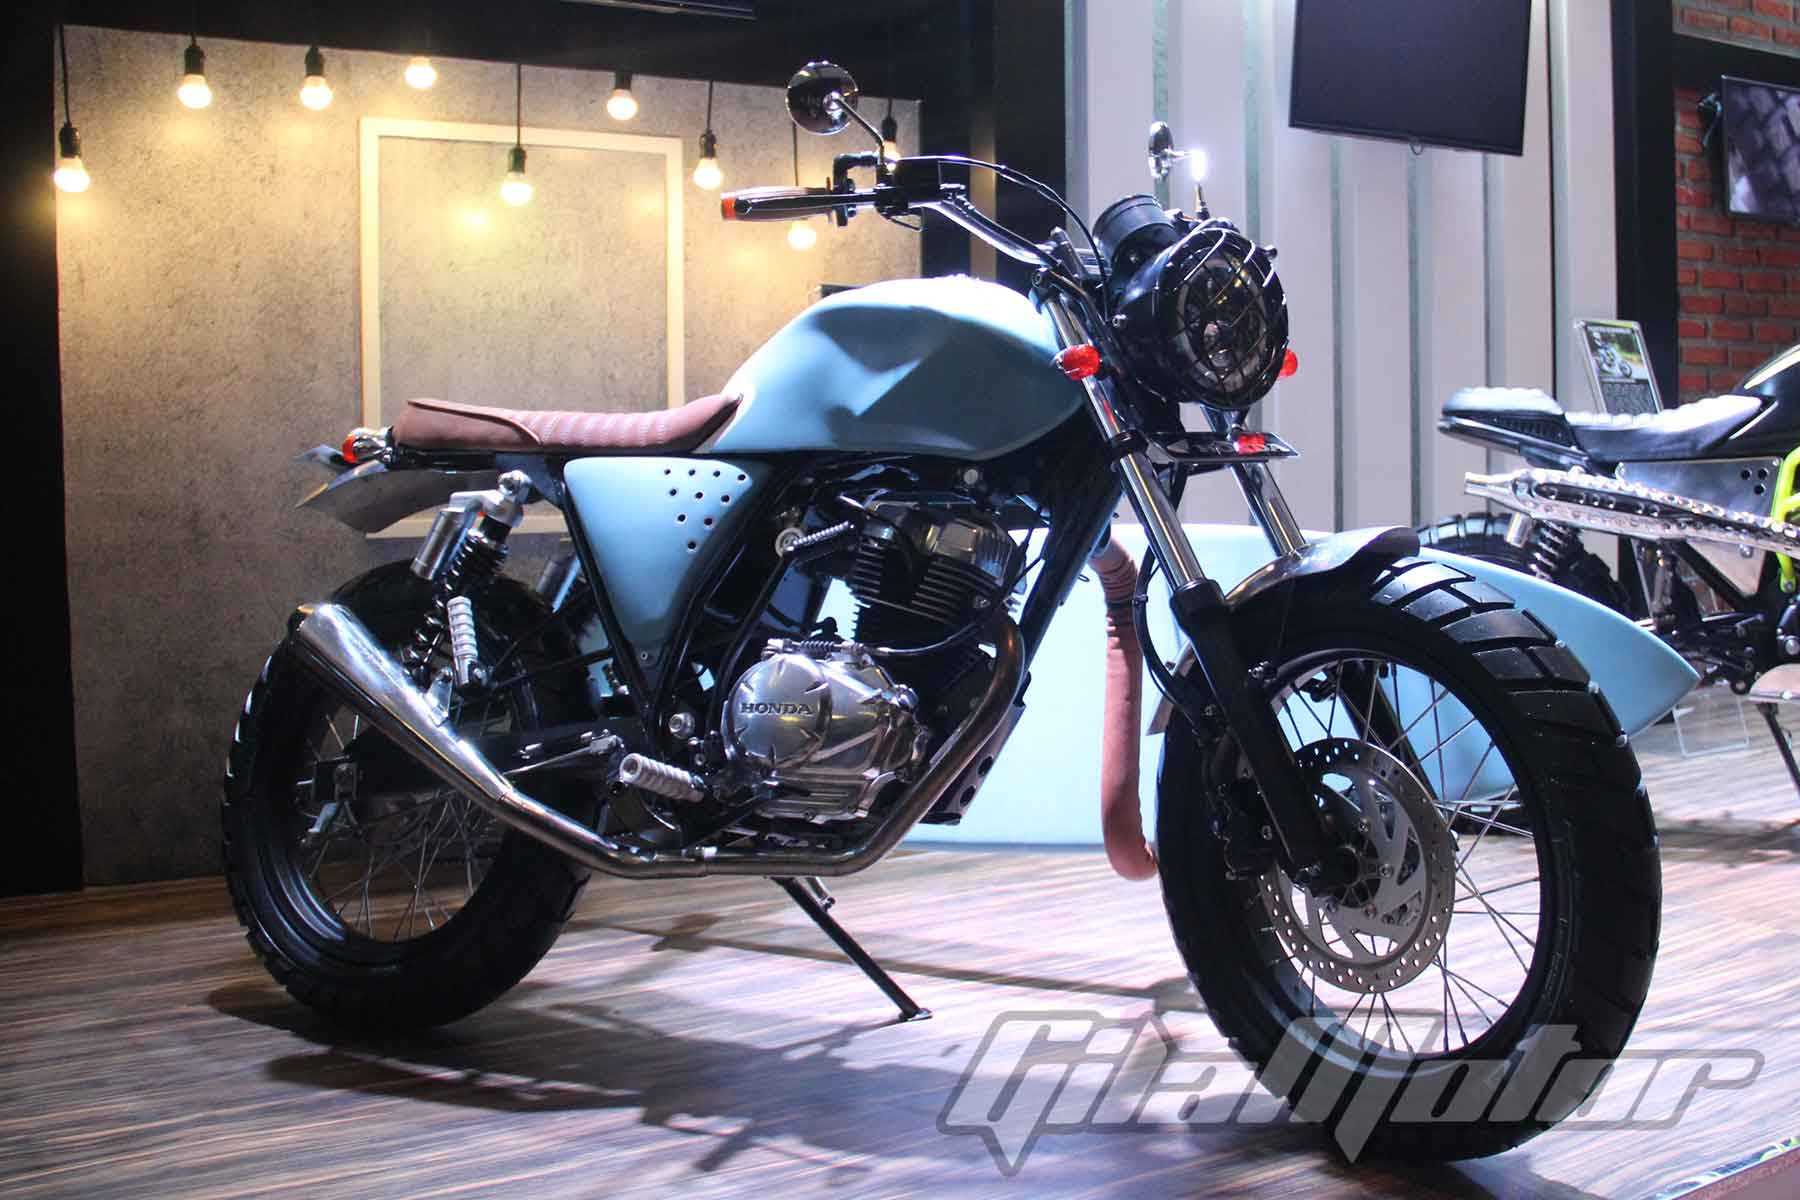 Deretan All New Honda CB150 Verza Custom Gilamotor